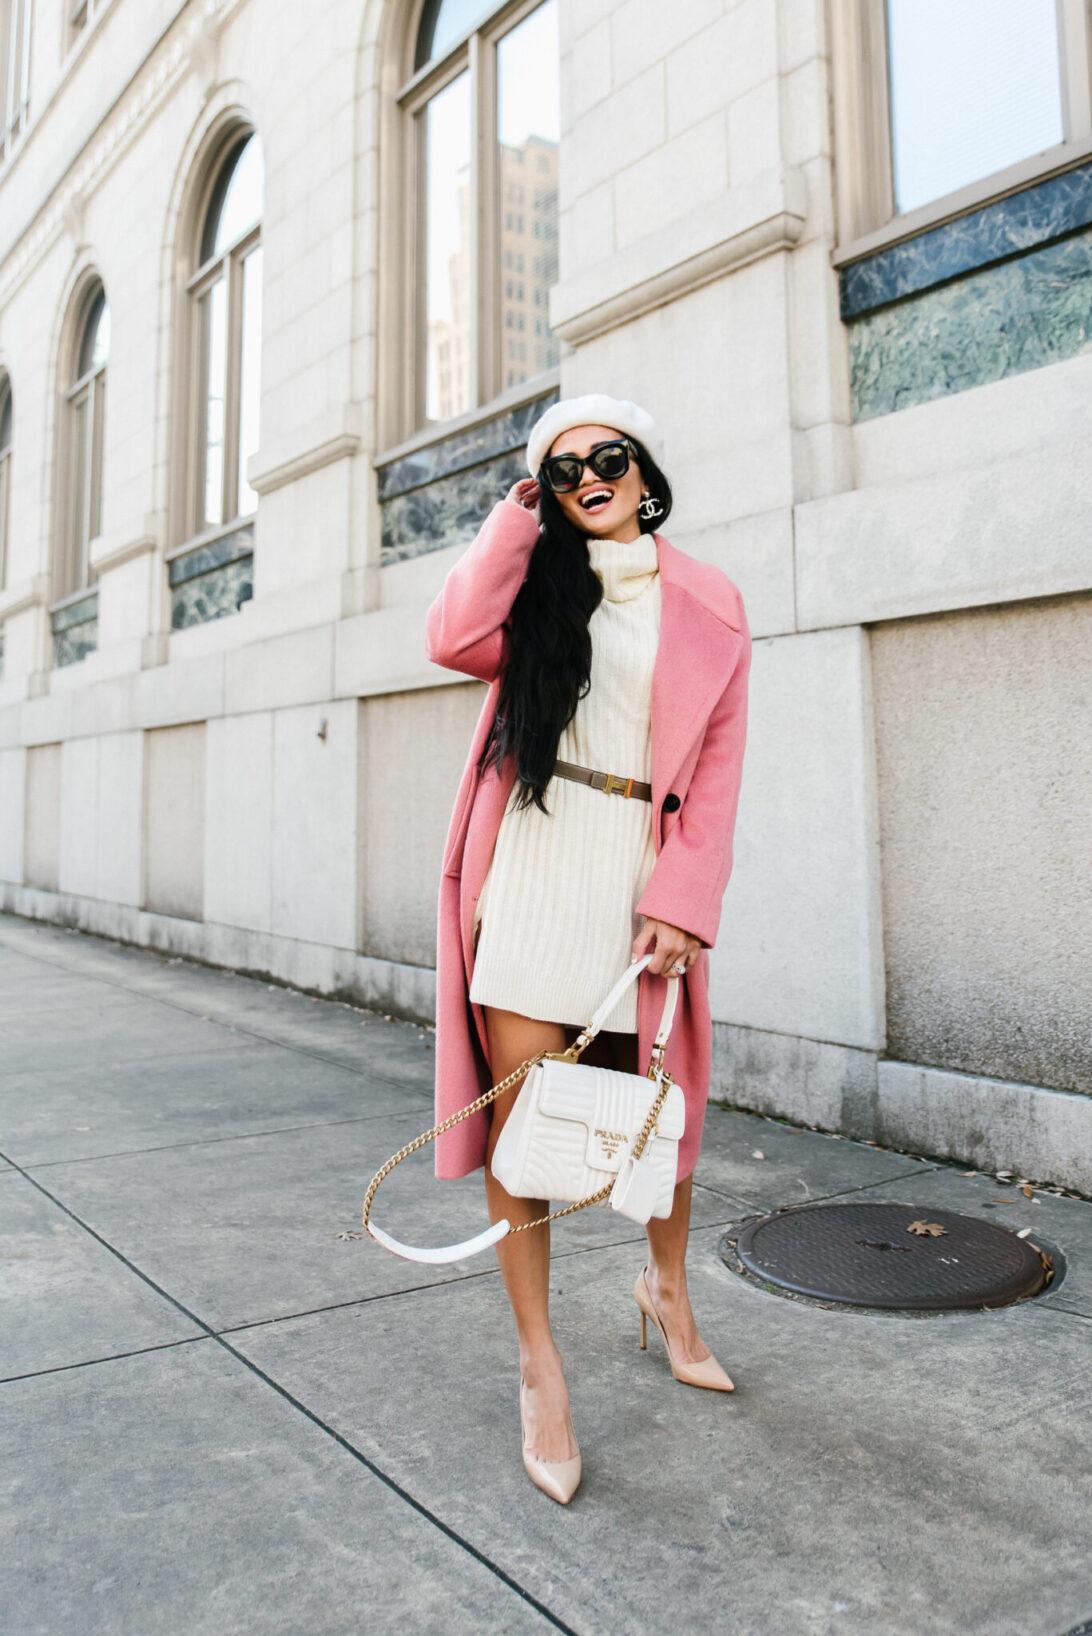 PRADA DIAGRAMME BAG, WHITE PRADA BAG, WHITE DESIGNER BAG, WHITE SWEATER DRESS, PARISIAN OUTFIT, VALENTINES LOOK